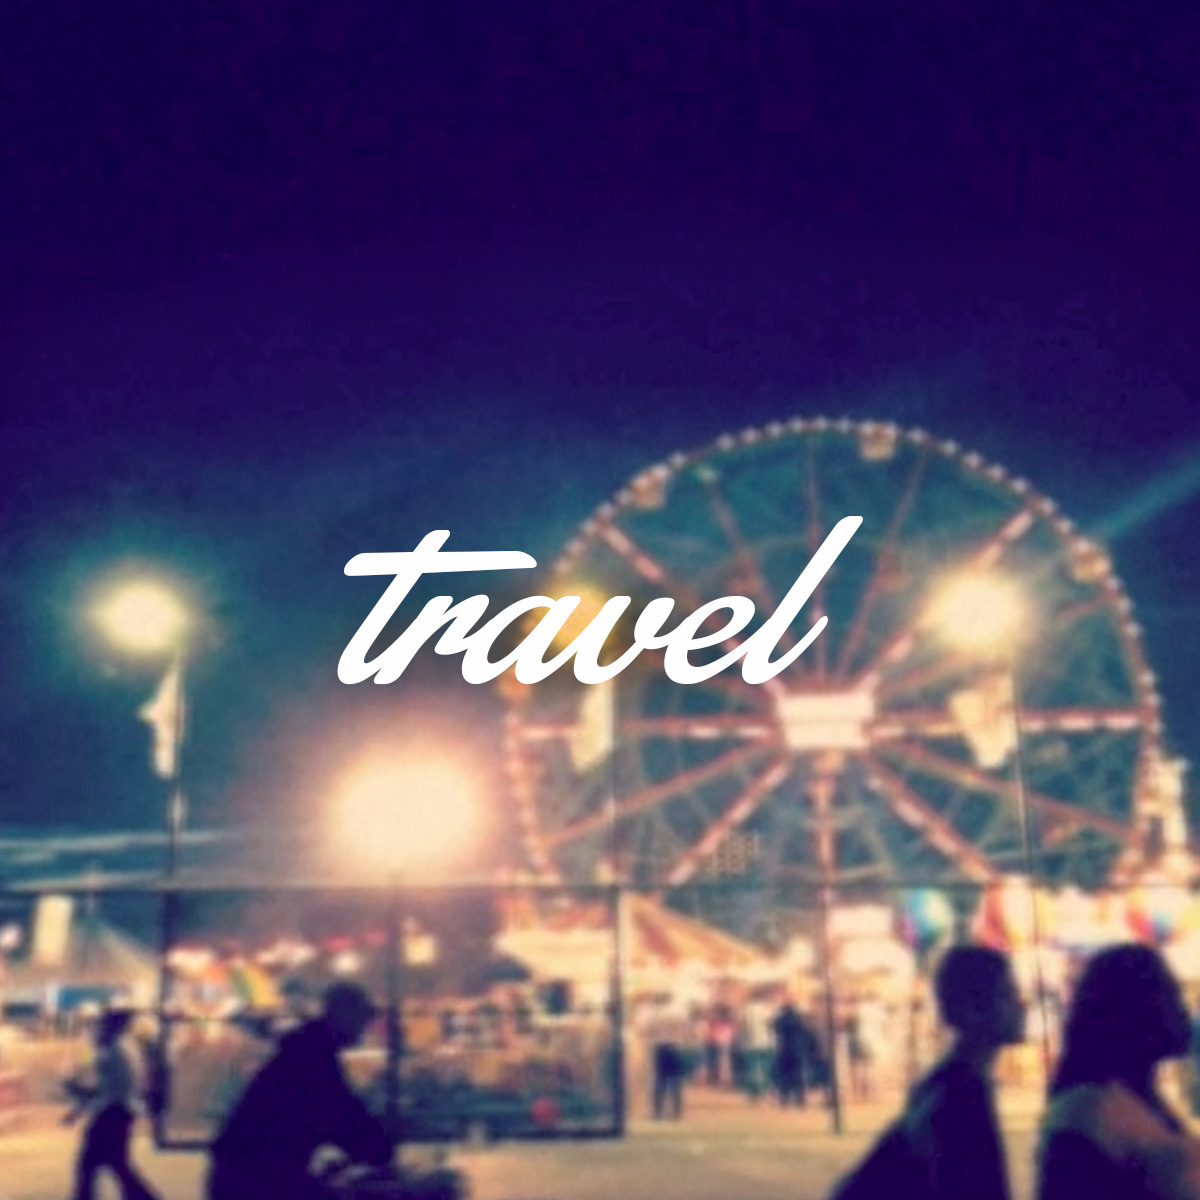 film type travel.jpg